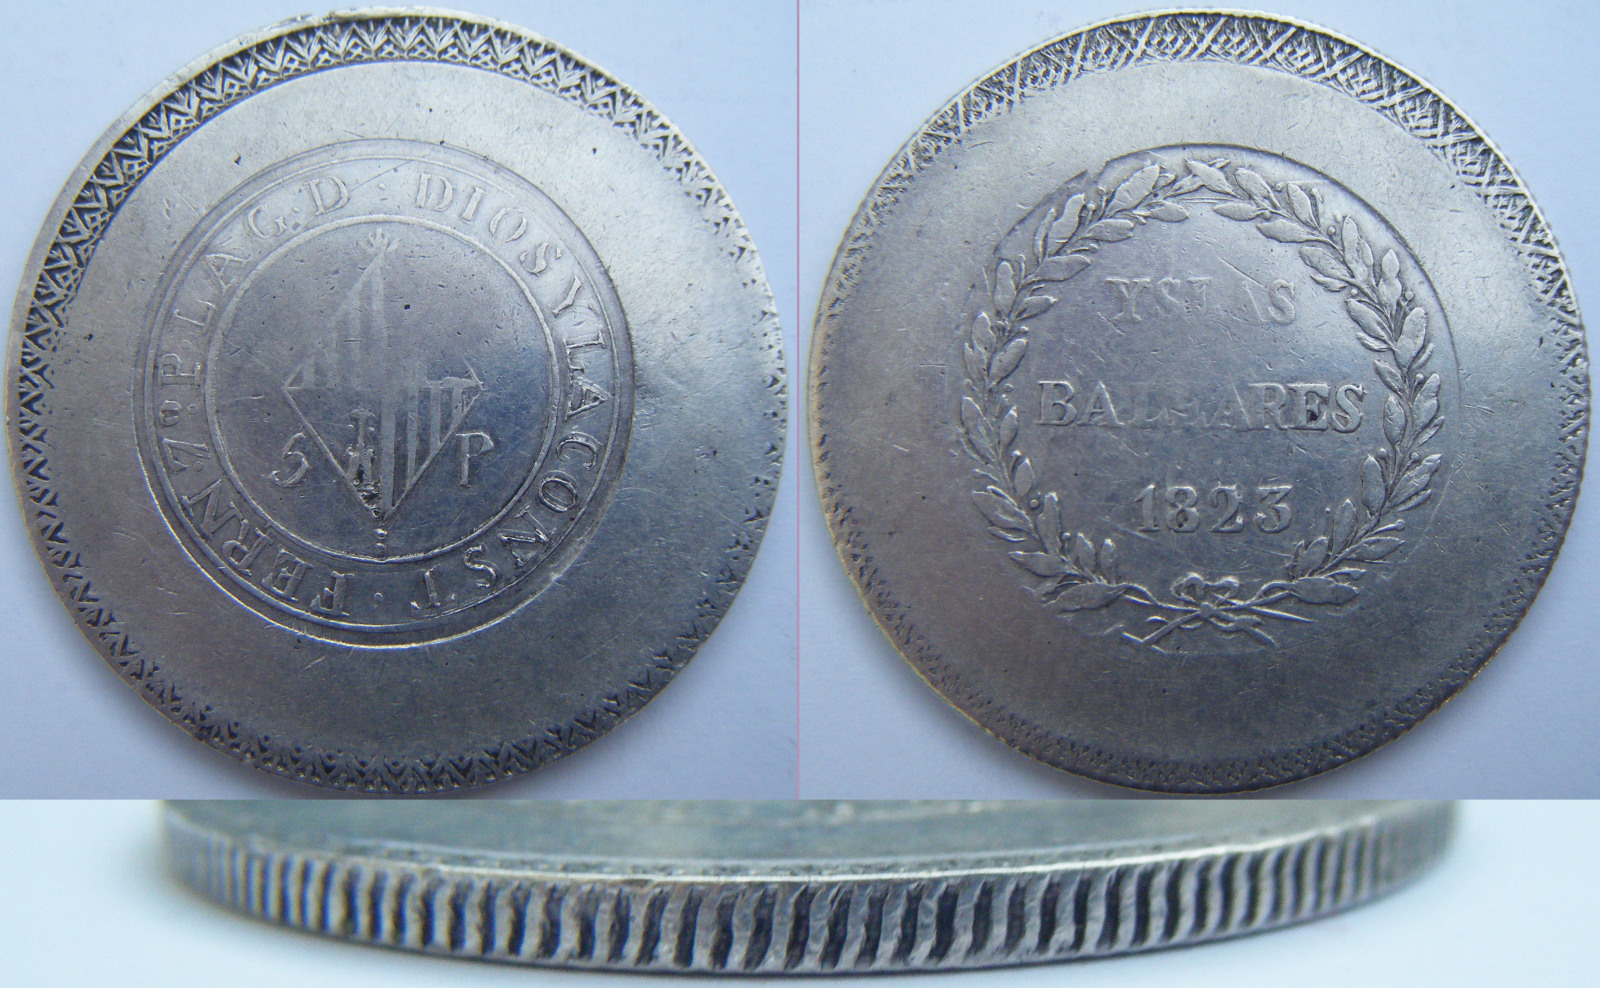 5 pesetas 1823. Fernando VII. Islas Baleares Mk9q0y